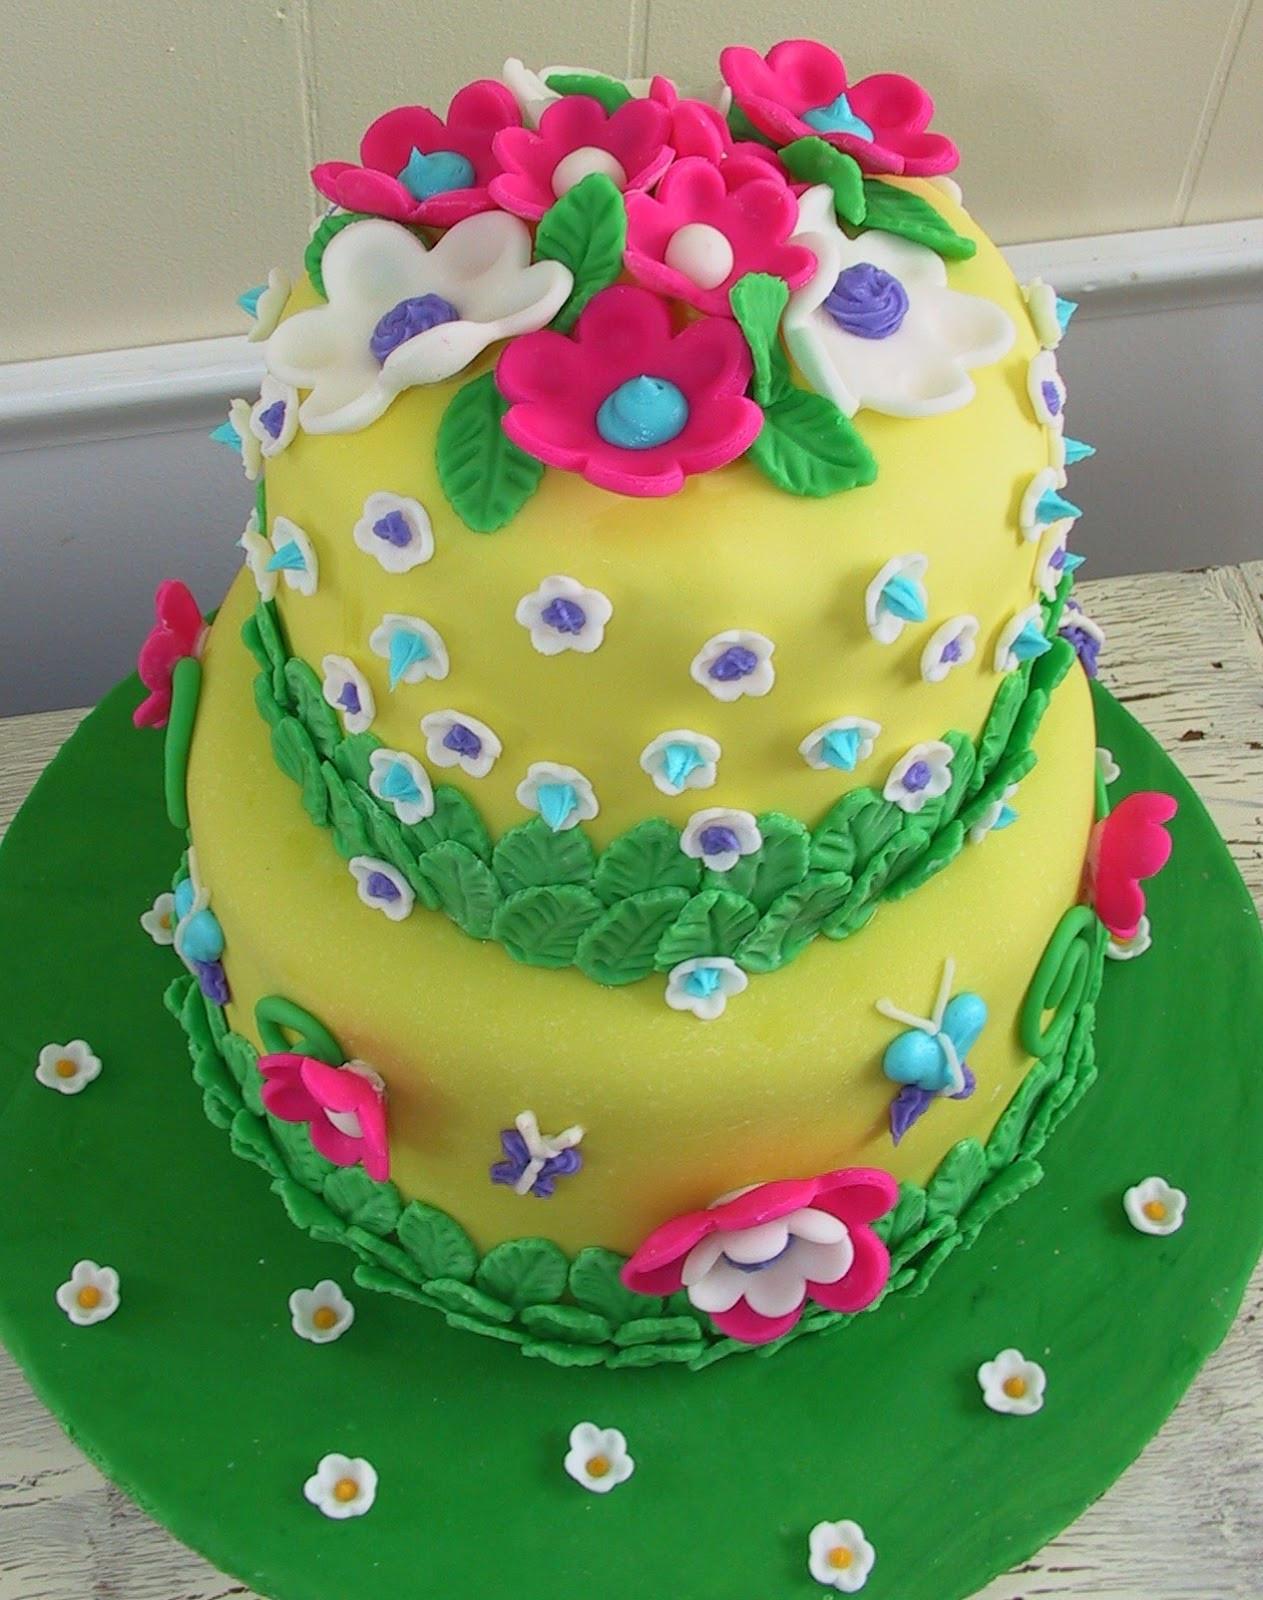 Flowers Birthday Cake  Delicious Cake Blogger Flower Birthday Cake Ideas